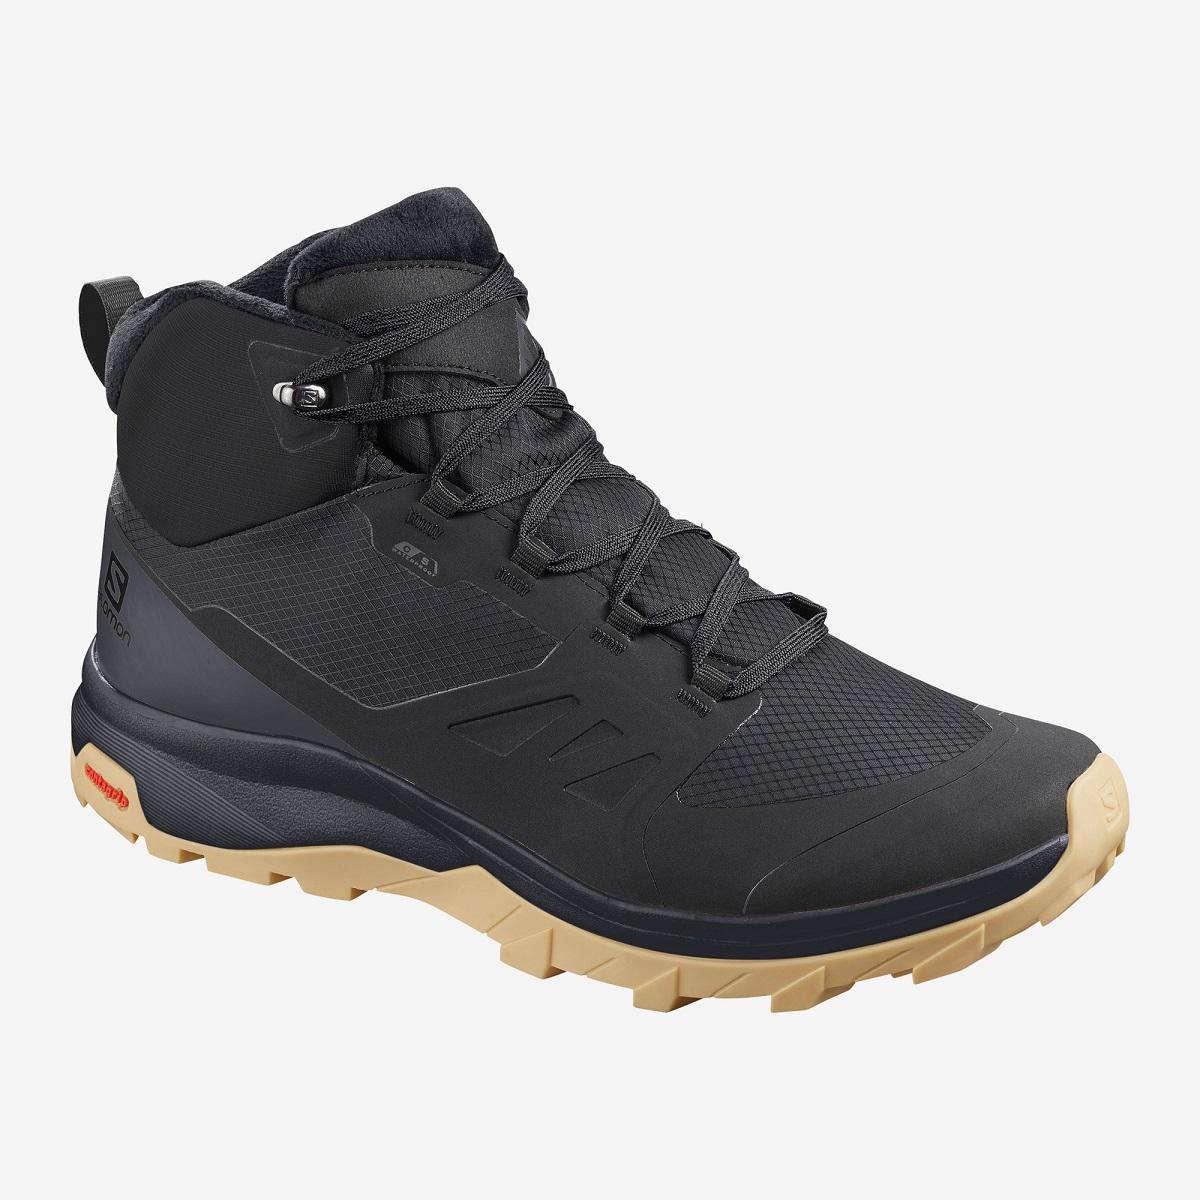 Ботинки утепленные OUTsnap CSWP